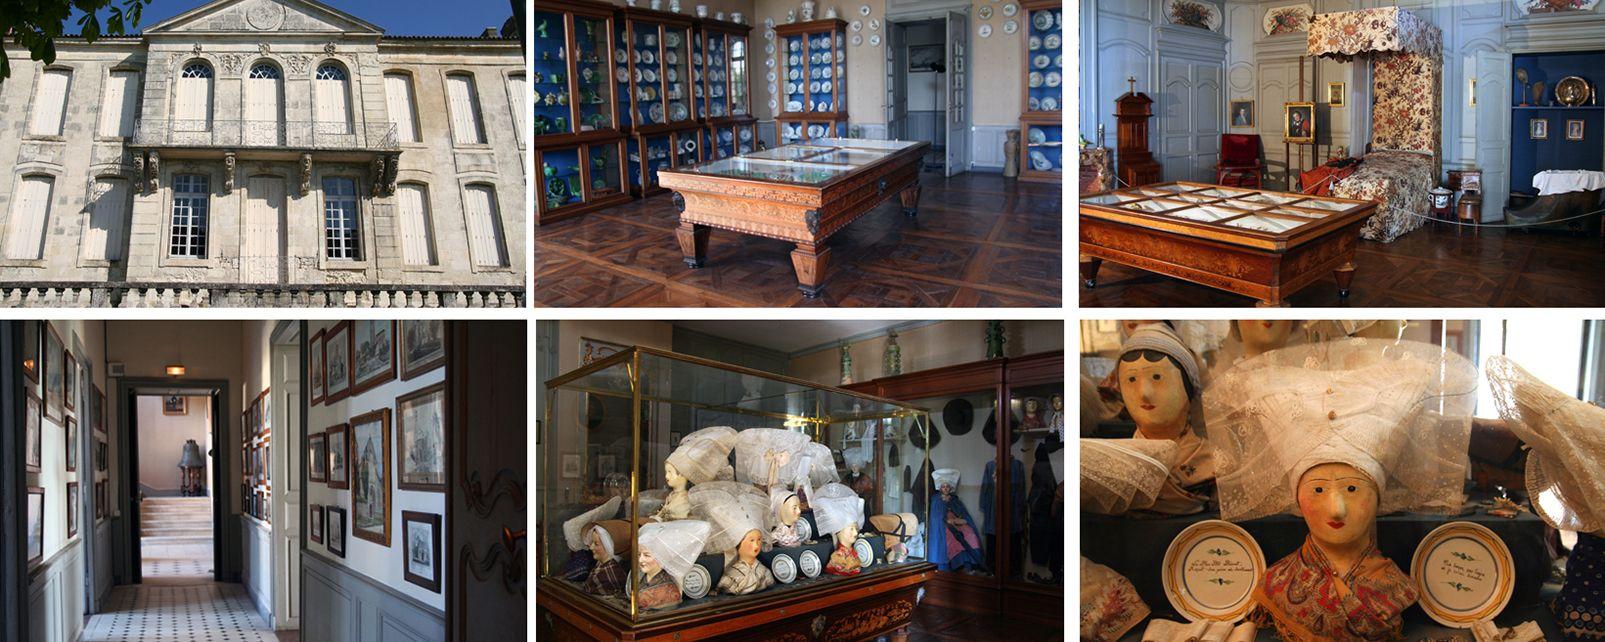 Dupuy Mestreau Regional Museum , France